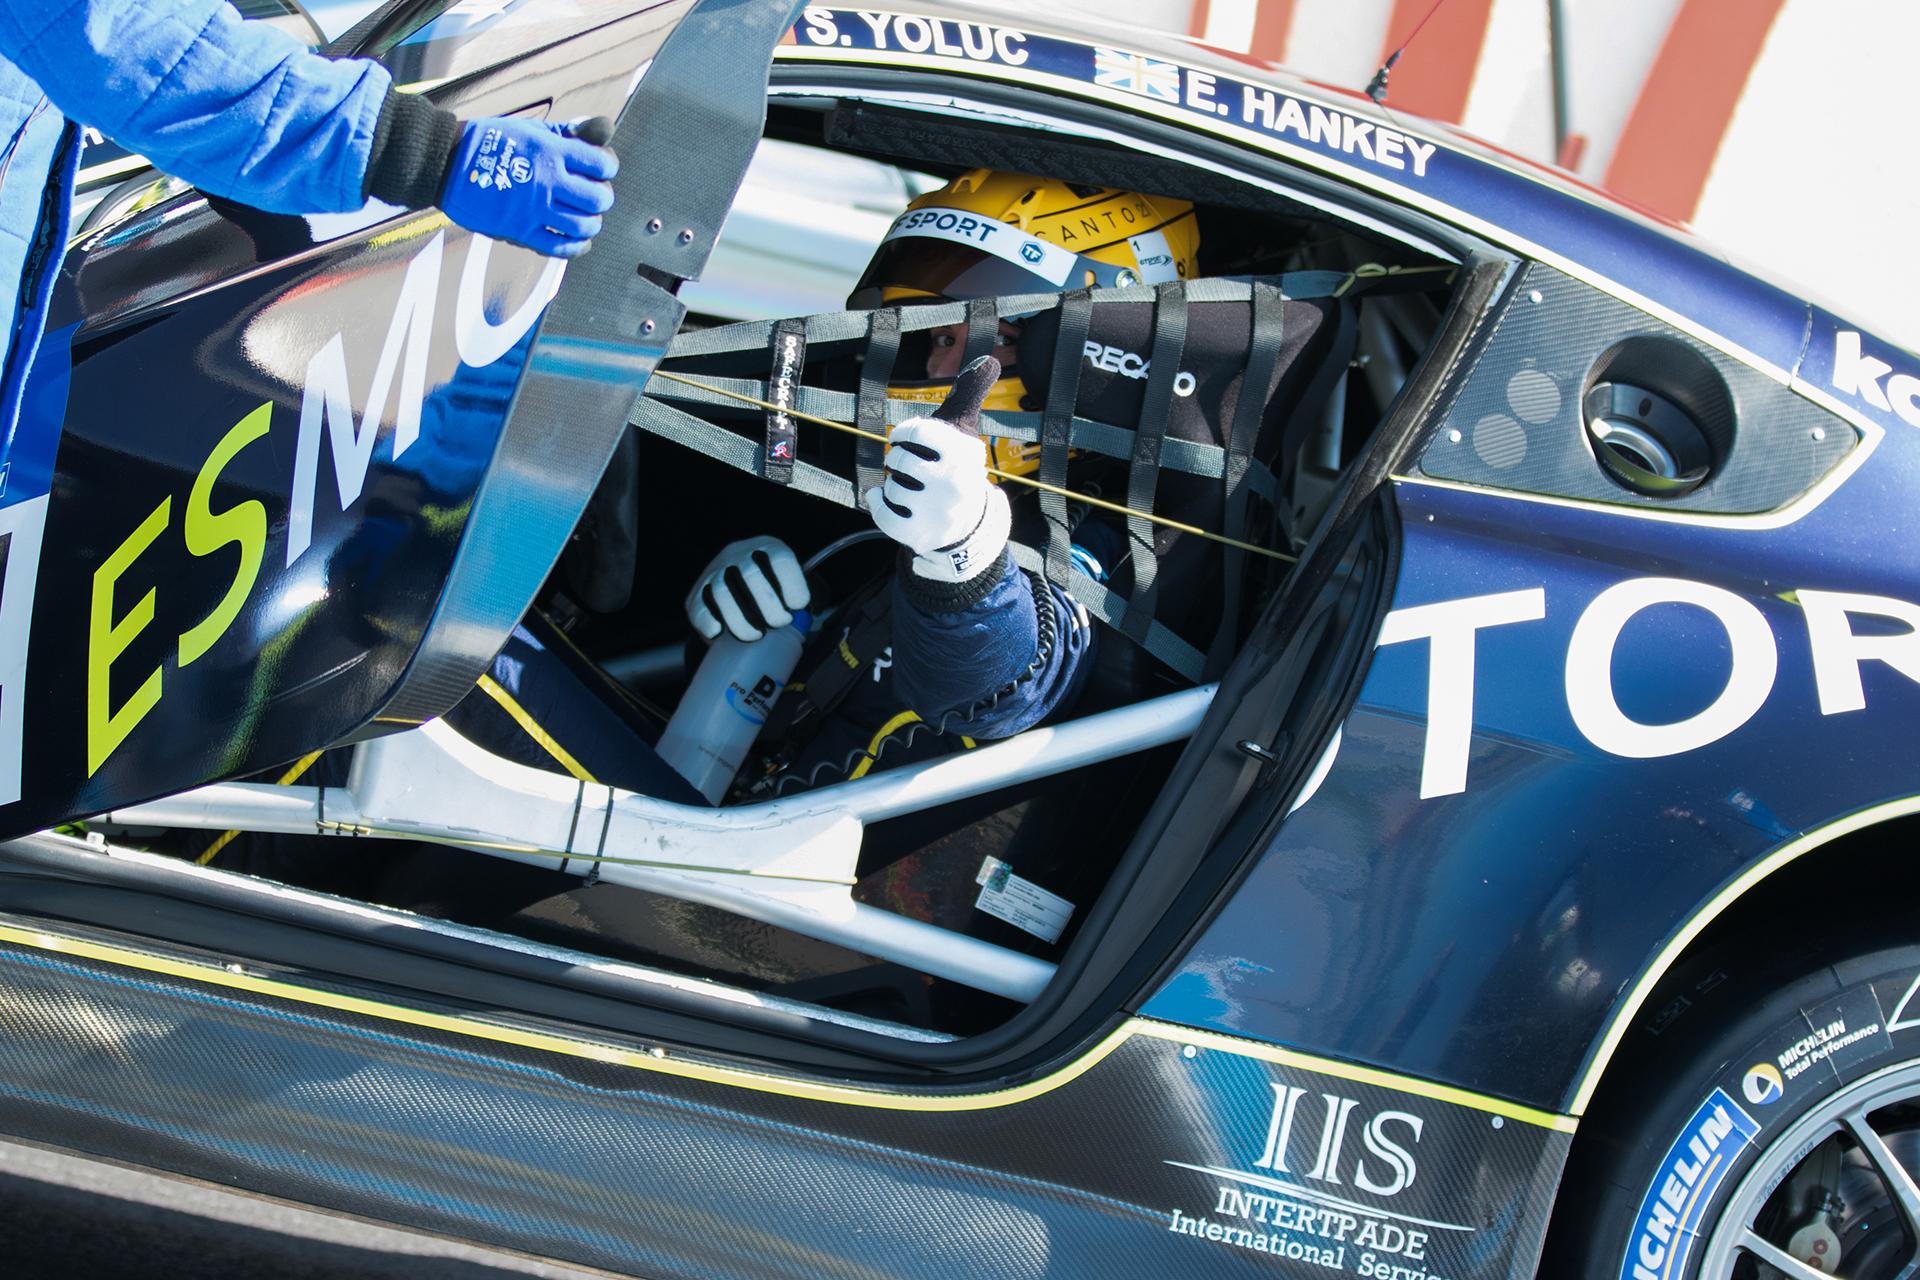 2016-GT3-LeMansCup-PaulRicard-71893.jpg